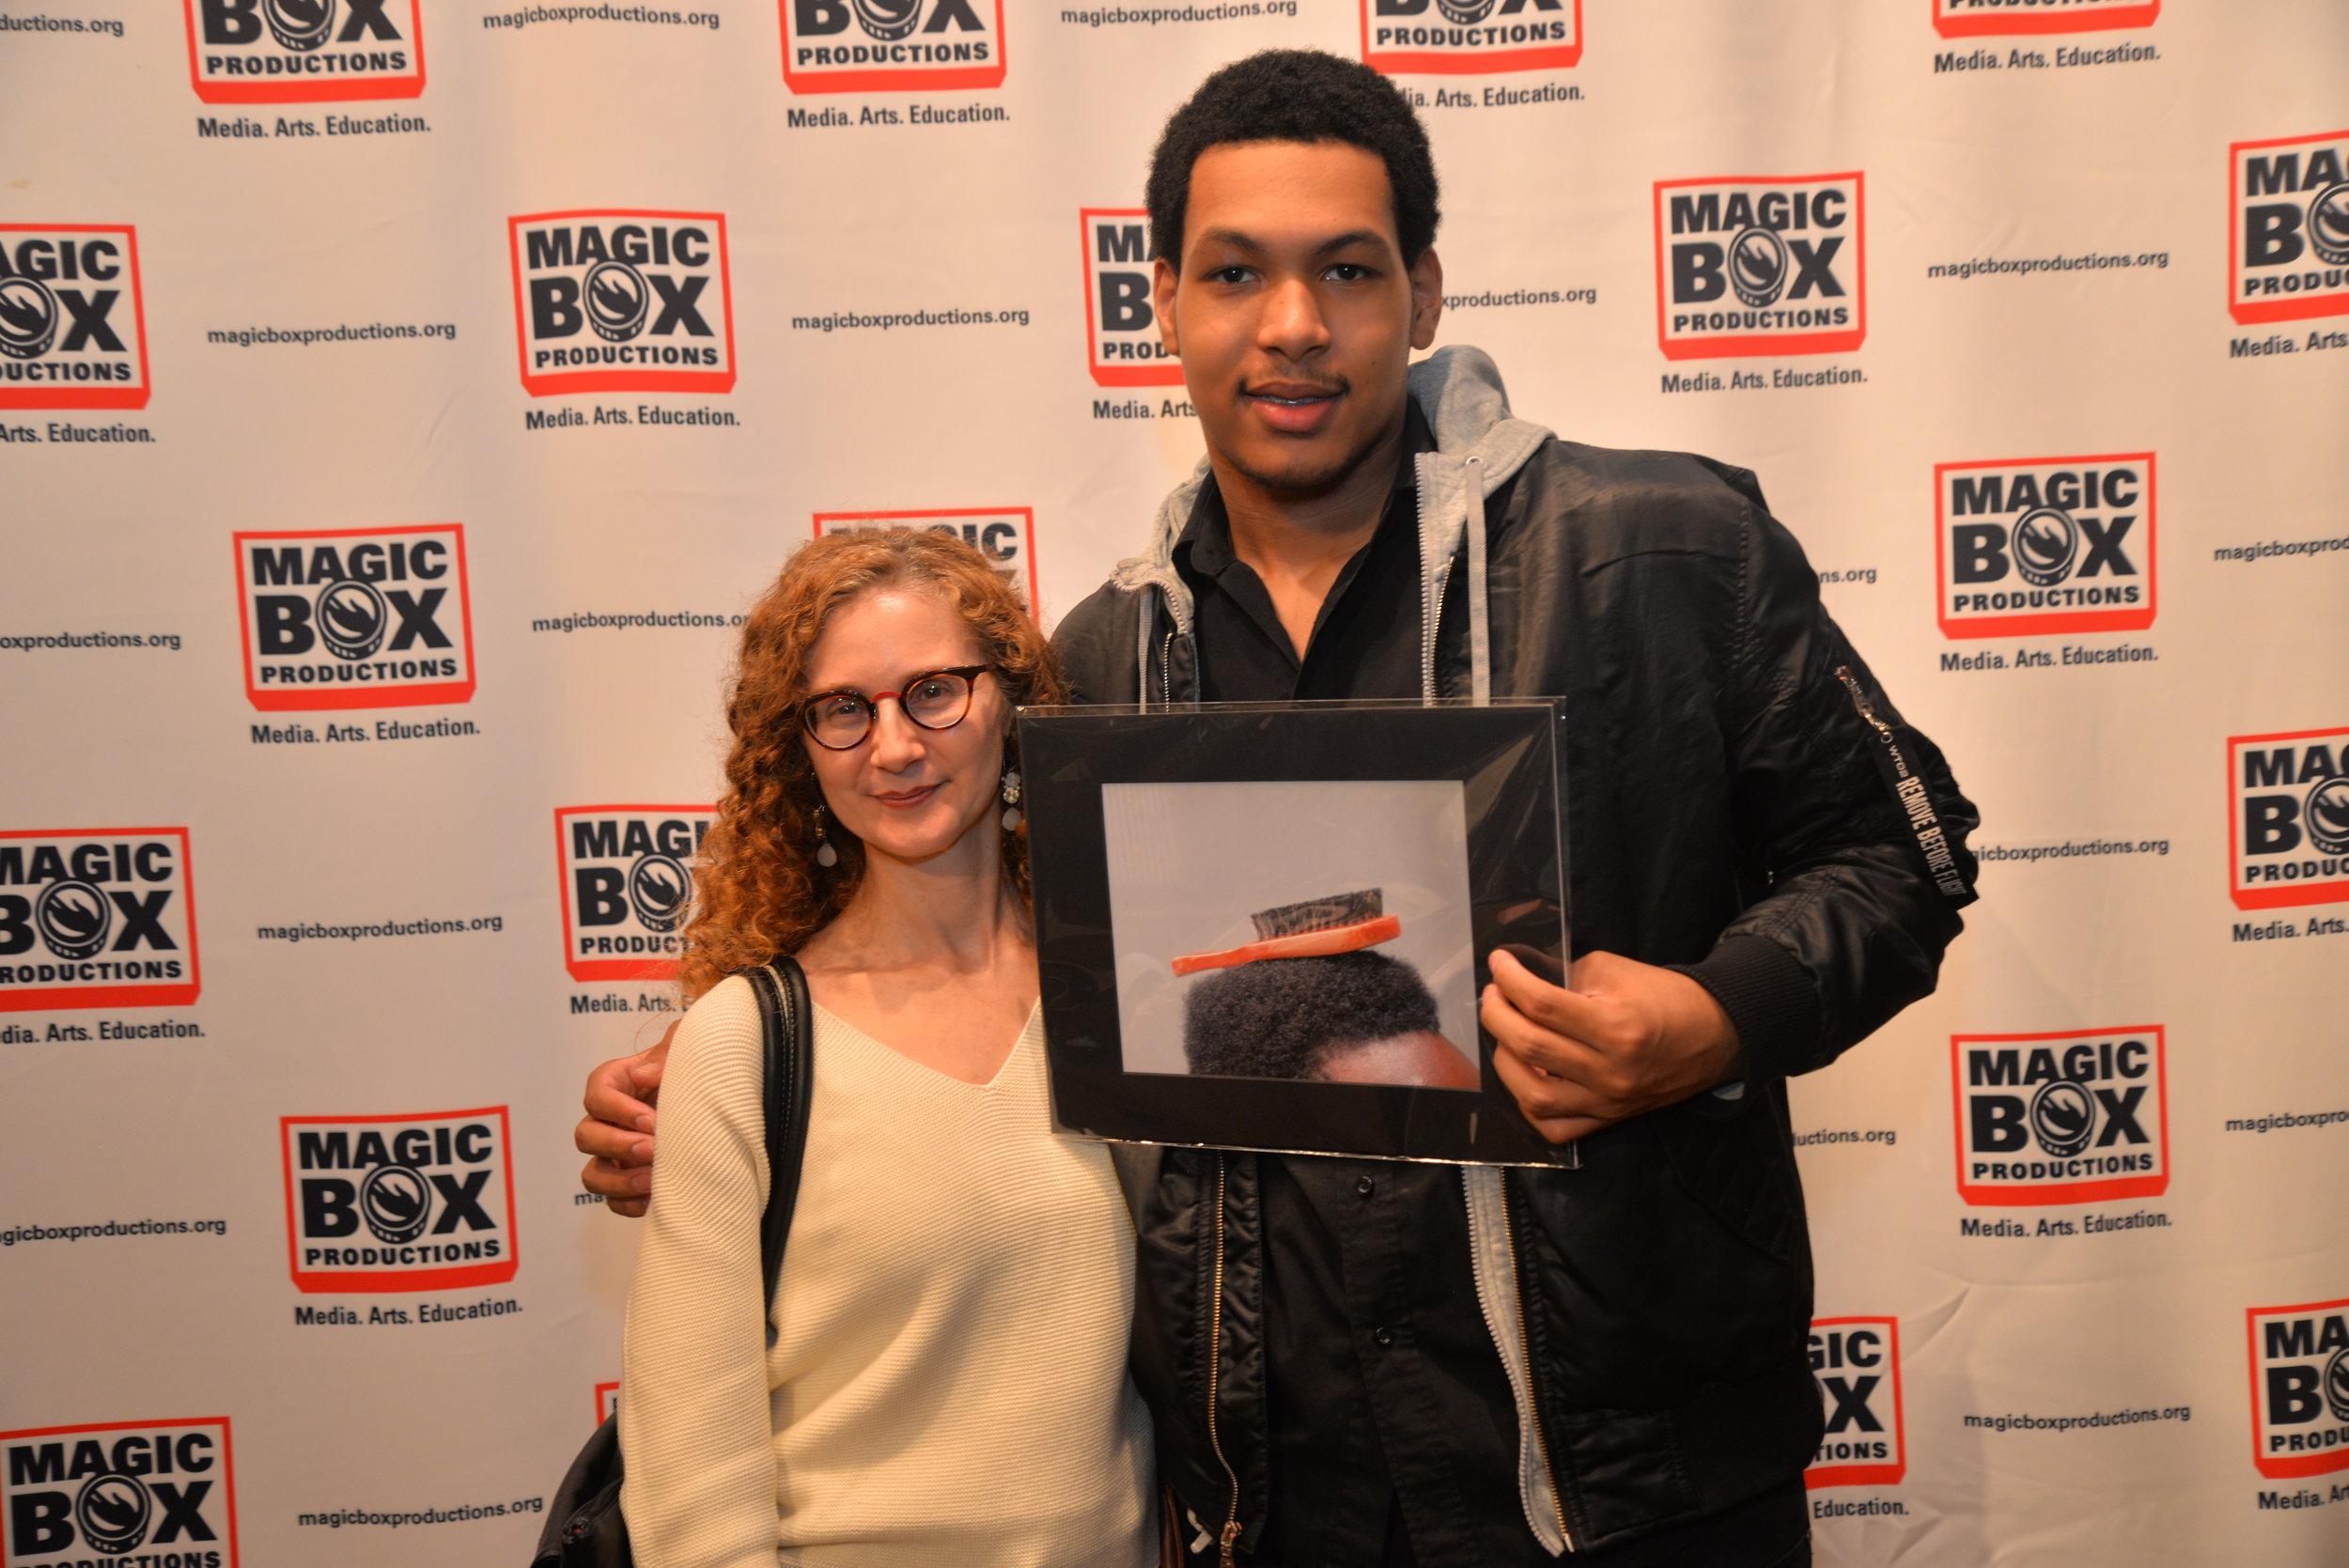 Magic Box Student Brandon with his teacher Elisa Degregorio